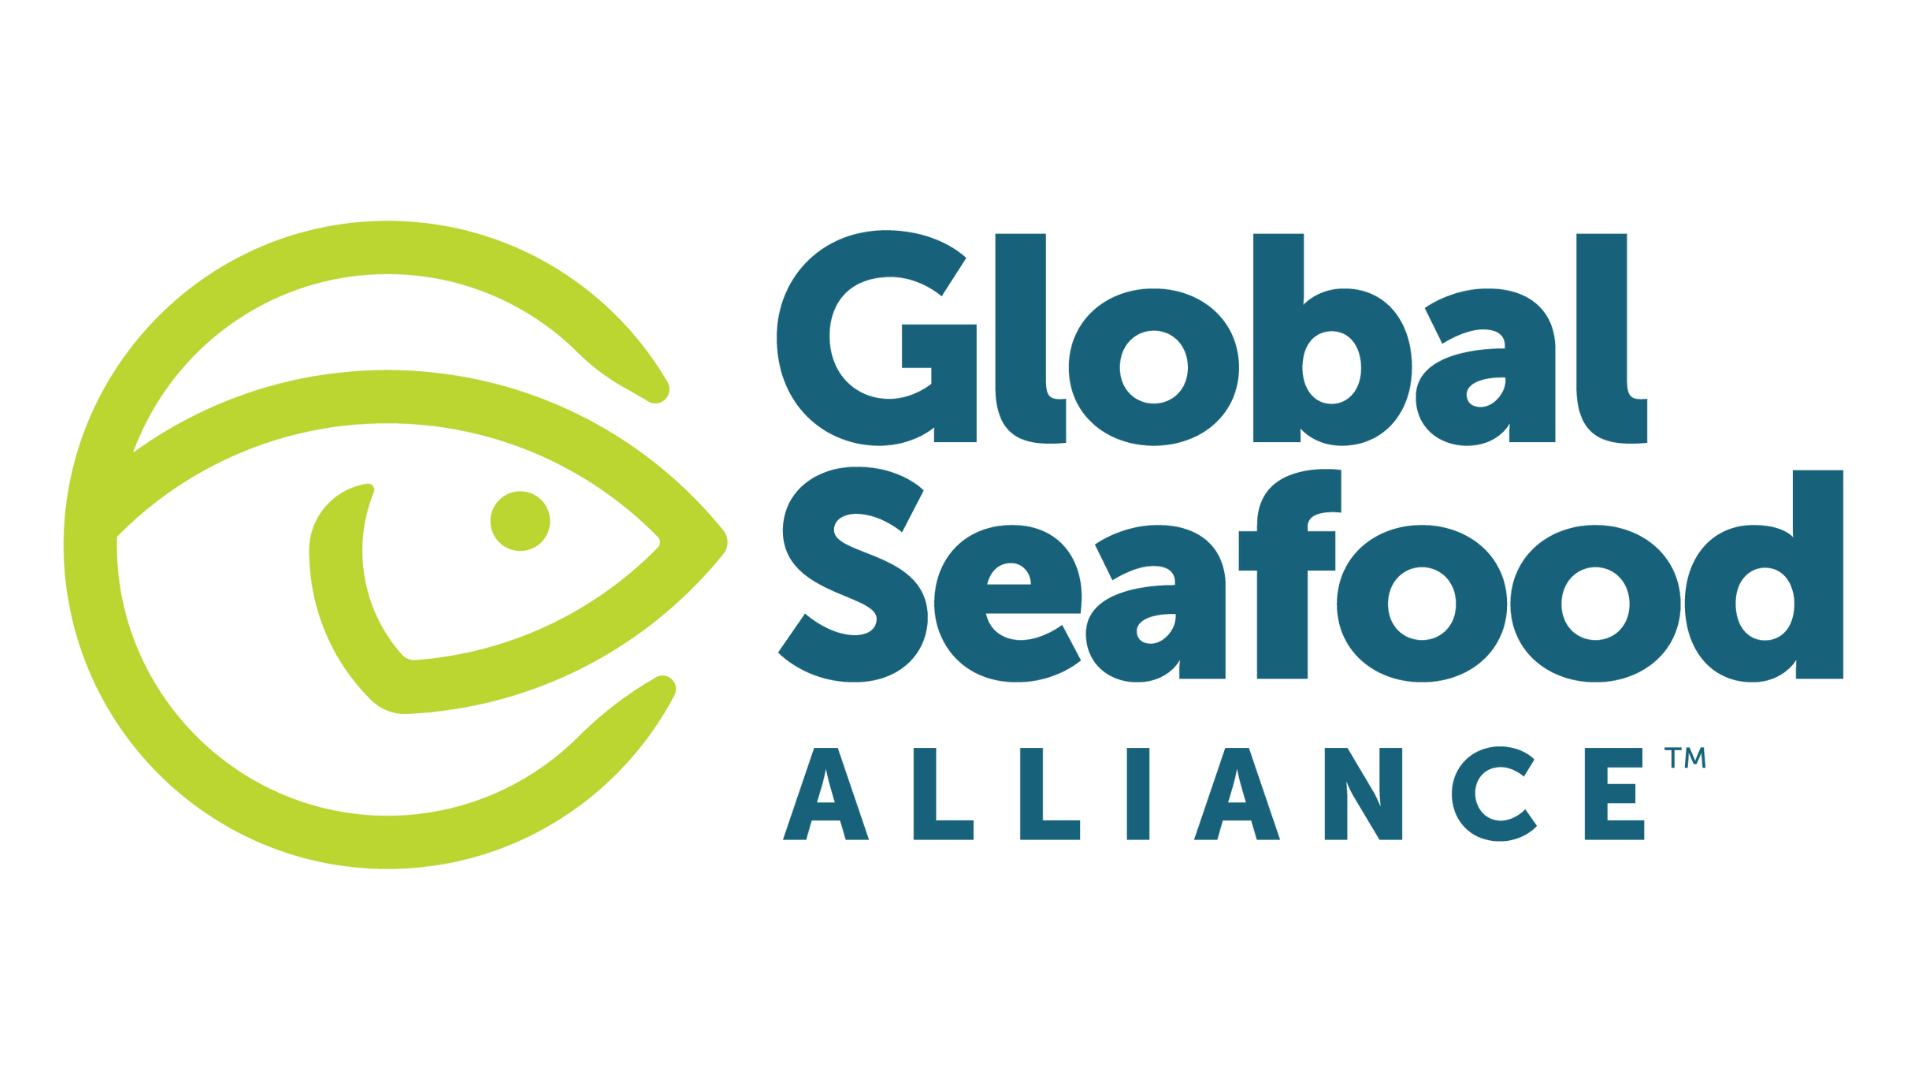 Global Seafood Alliance logo